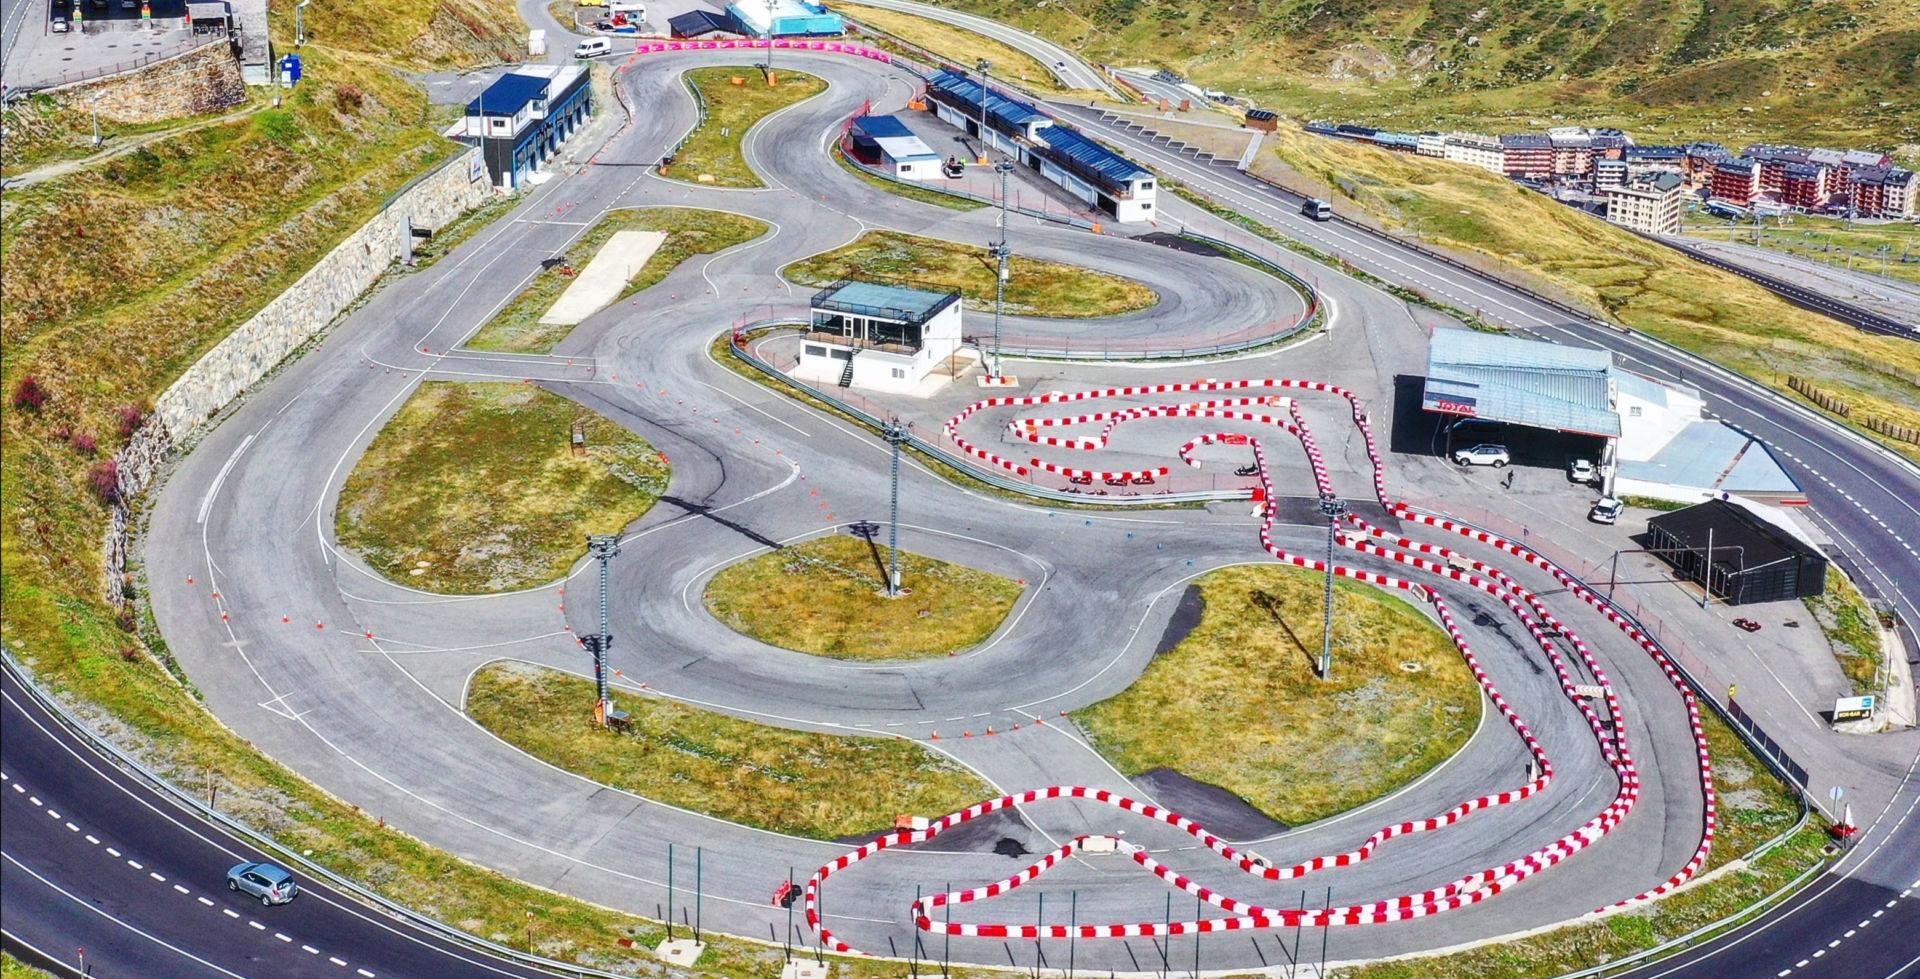 The Andorra Circuit. Photo courtesy Reale Avintia Racing.